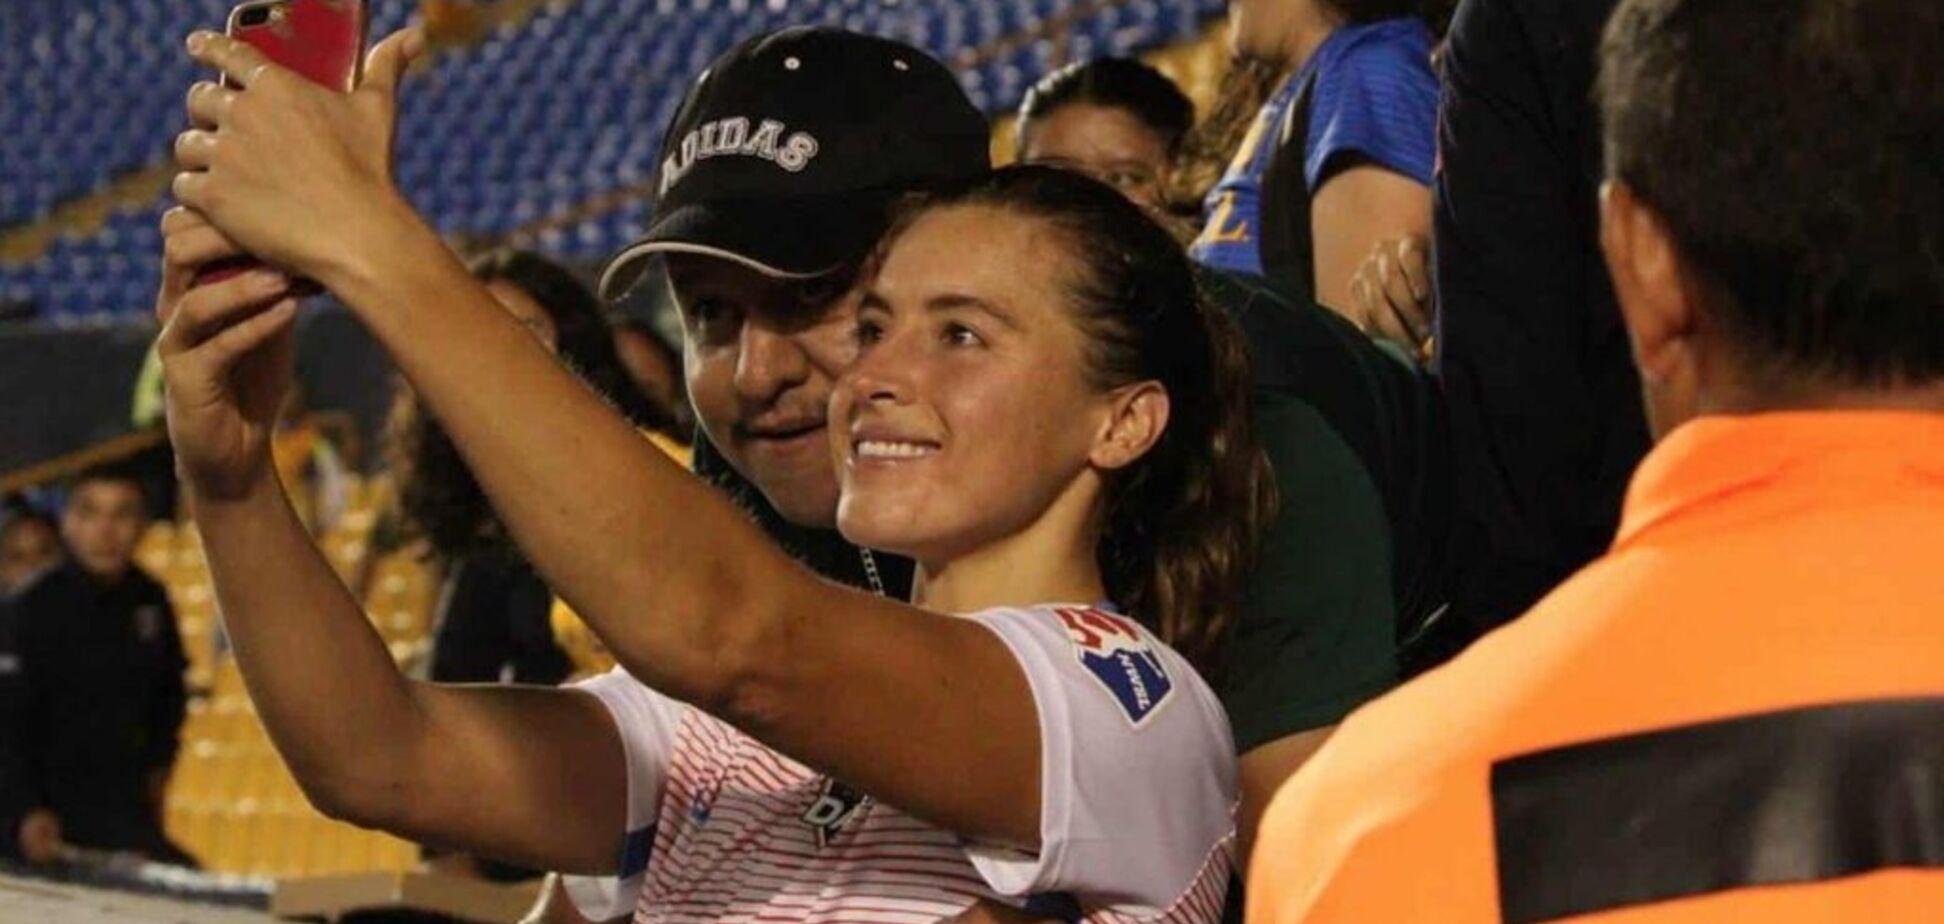 Скандал дня: фанат схватил за грудь футболистку сборной США — фотофакт